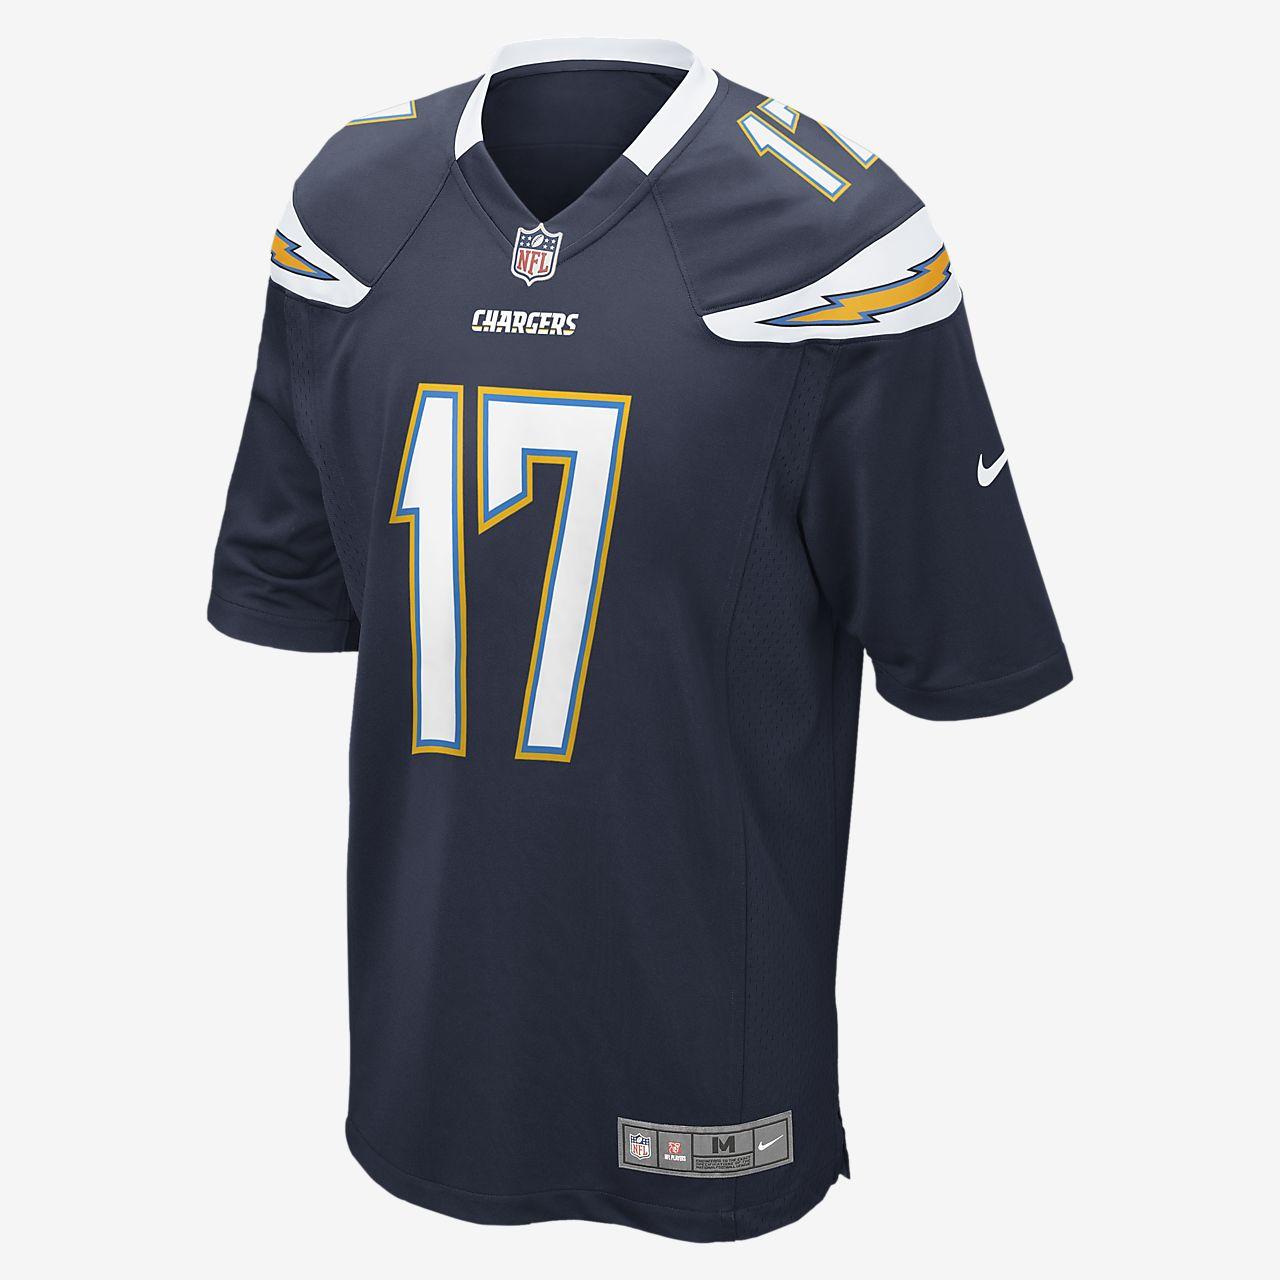 NFL Los Angeles Chargers (Philip Rivers) American Football Herren-Heimtrikot